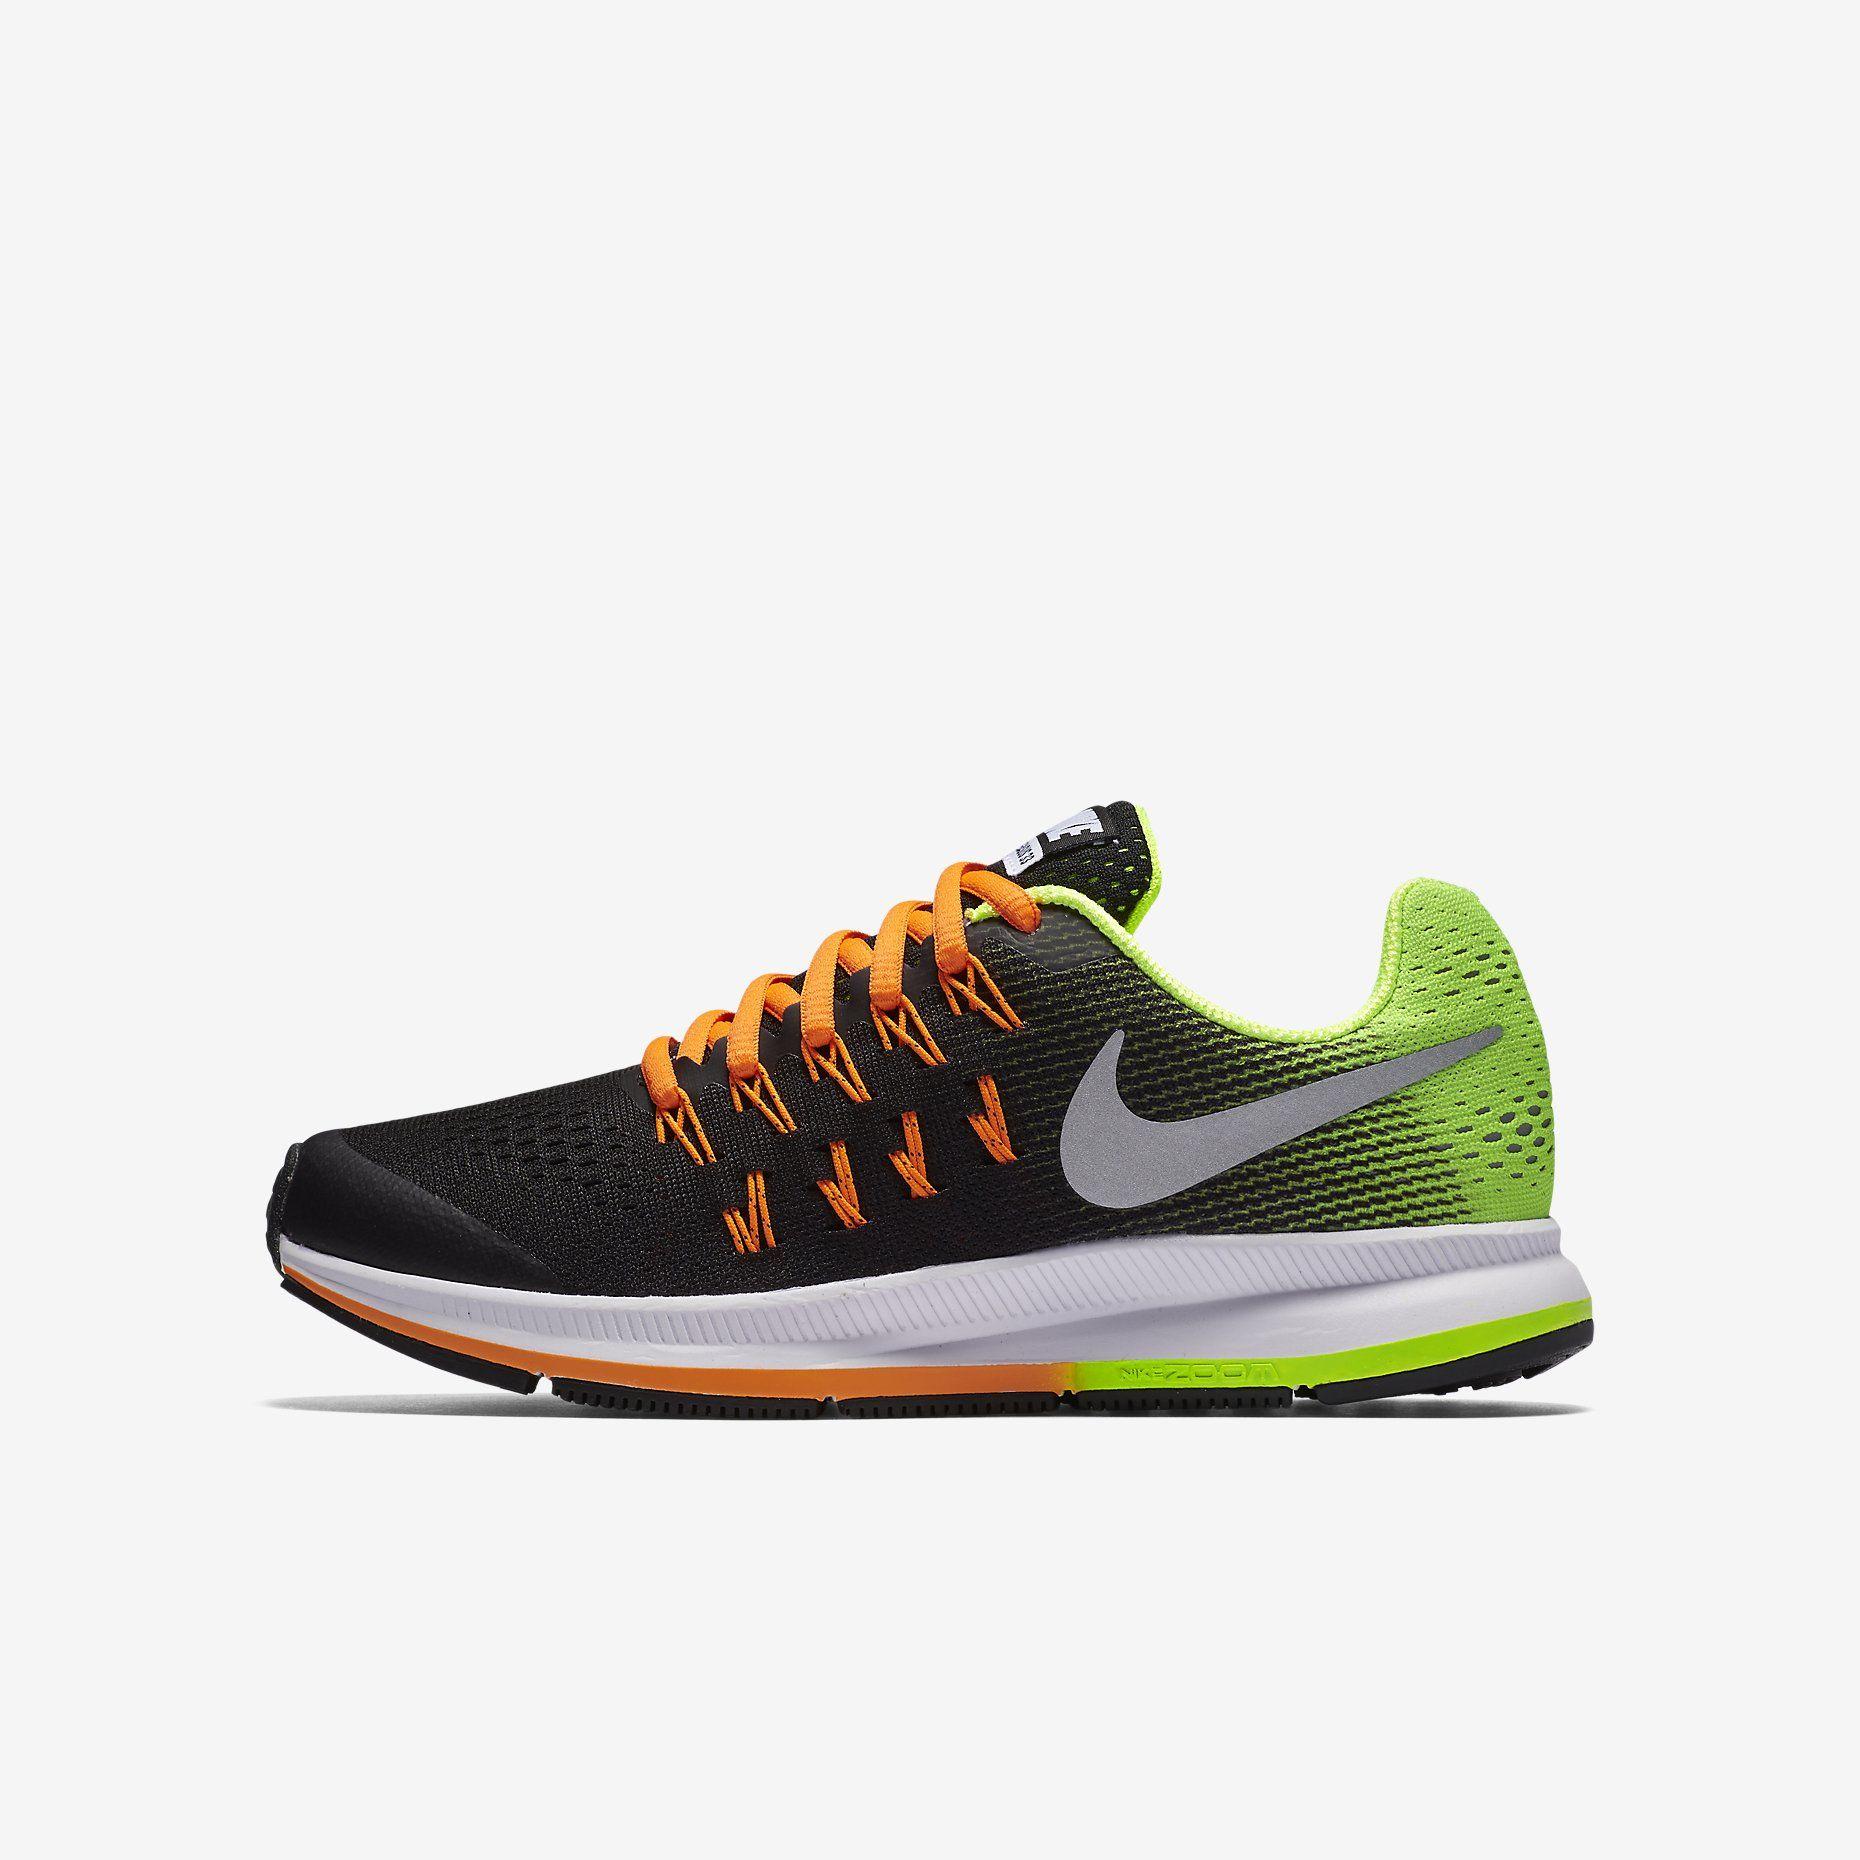 51c2283d7 Shop Nike for shoes